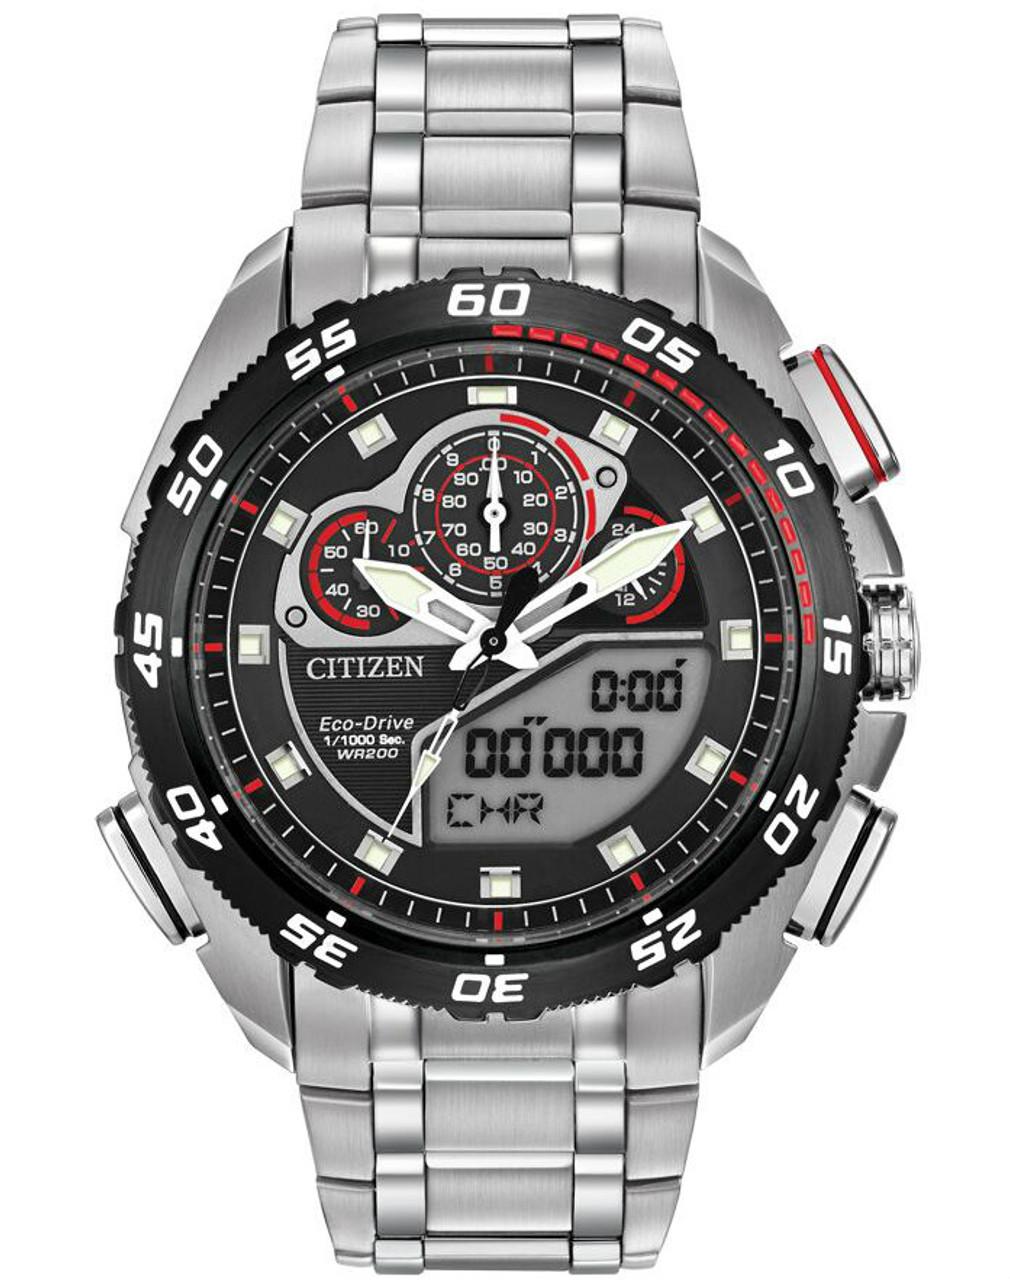 f33e280b5 Citizen Promaster JW0111-55E Men's Eco-Drive Racing Digital Sport Watch